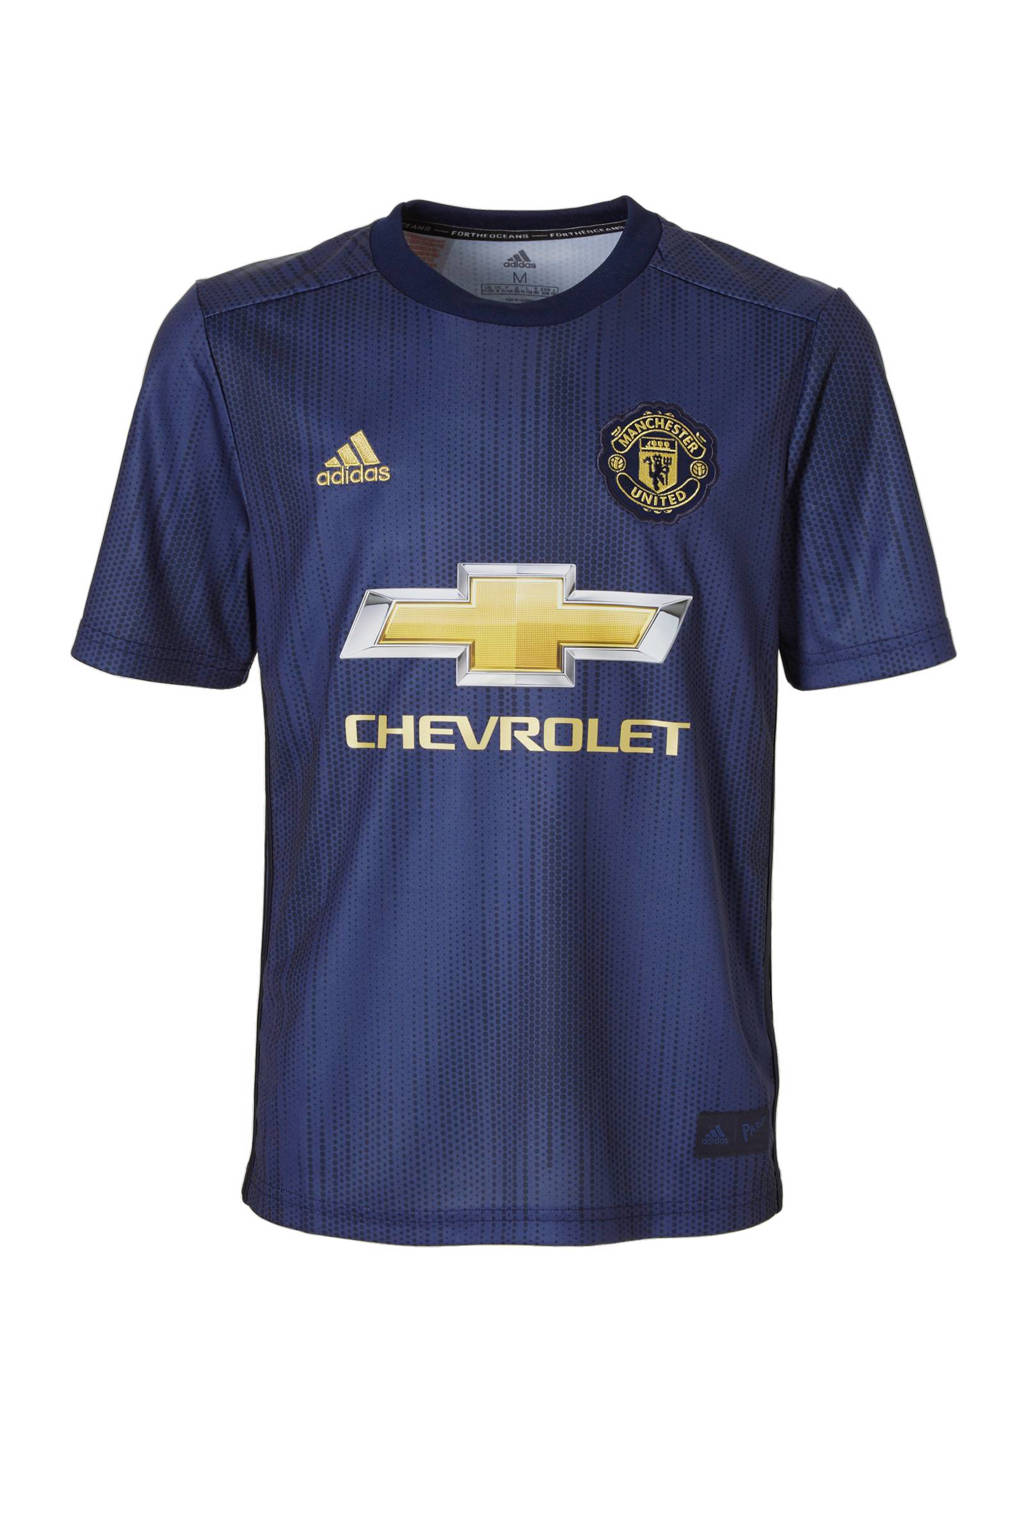 adidas Performance Junior Manchester United voetbalshirt, Donkerblauw/ bruin